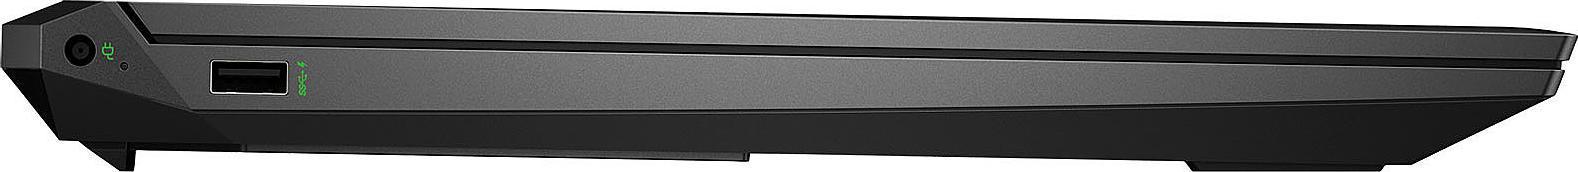 HP Pavilion Gaming 15-ec0025nf